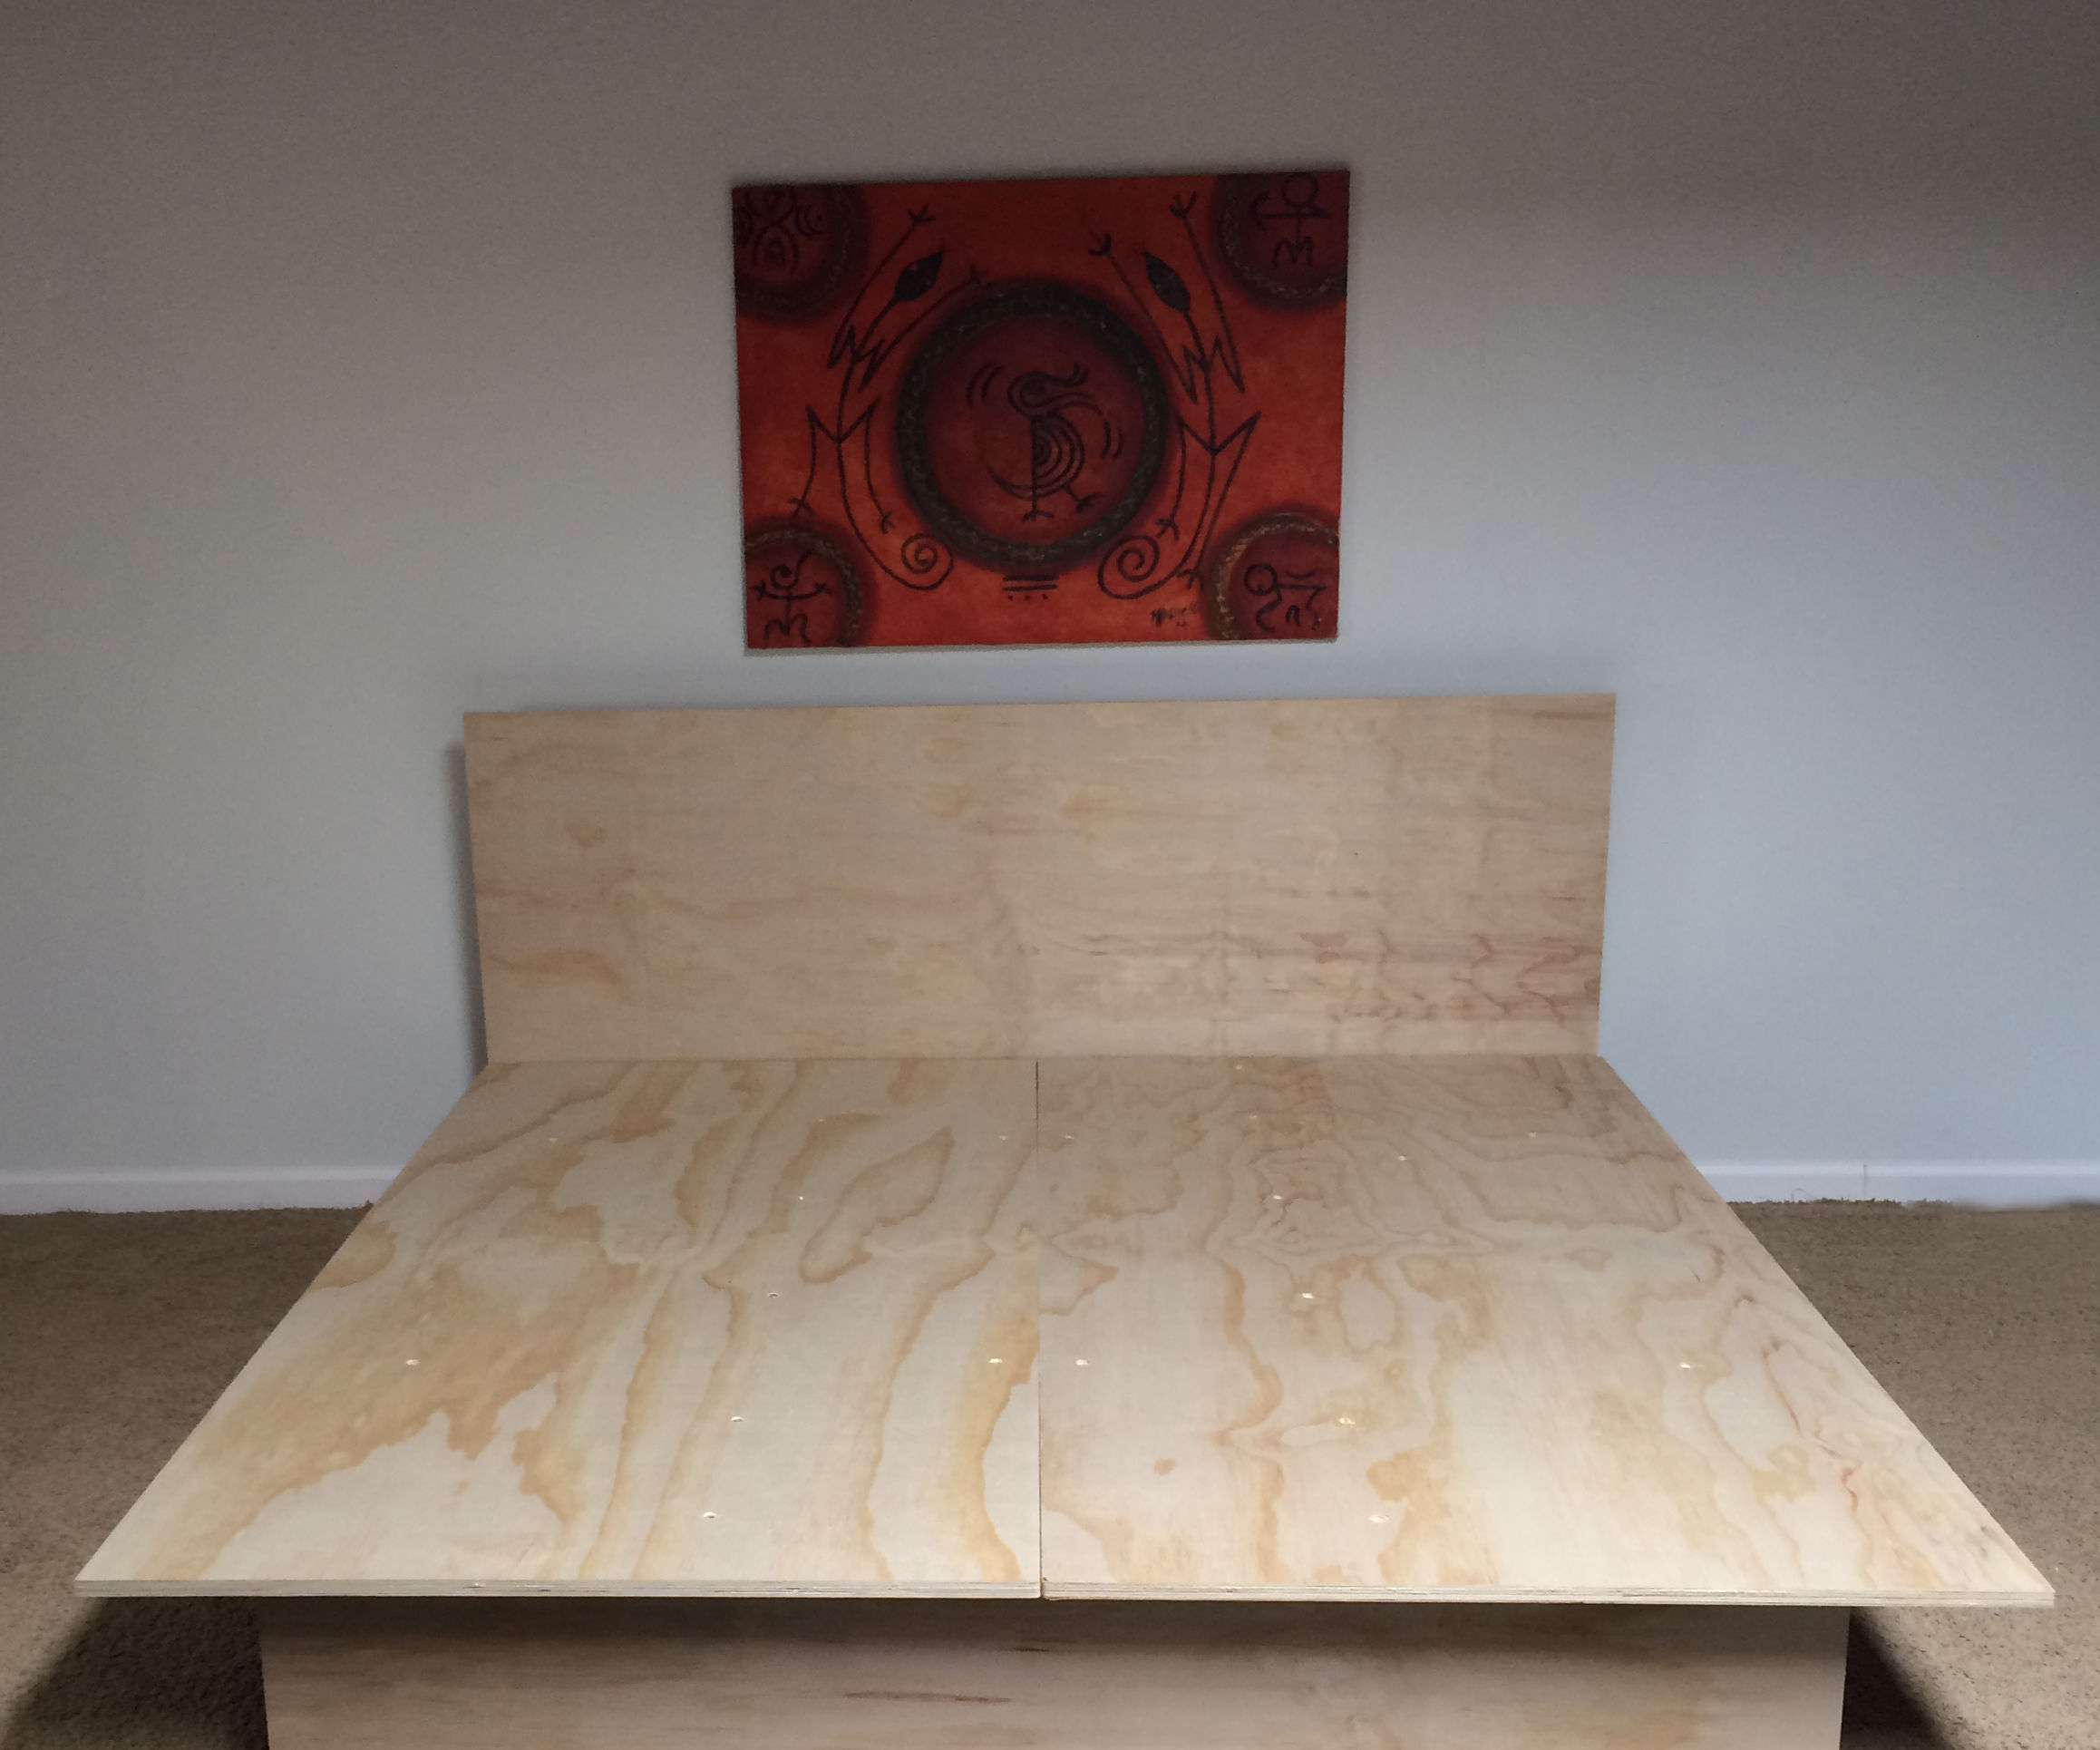 LuxO's EZ King Bed Frame